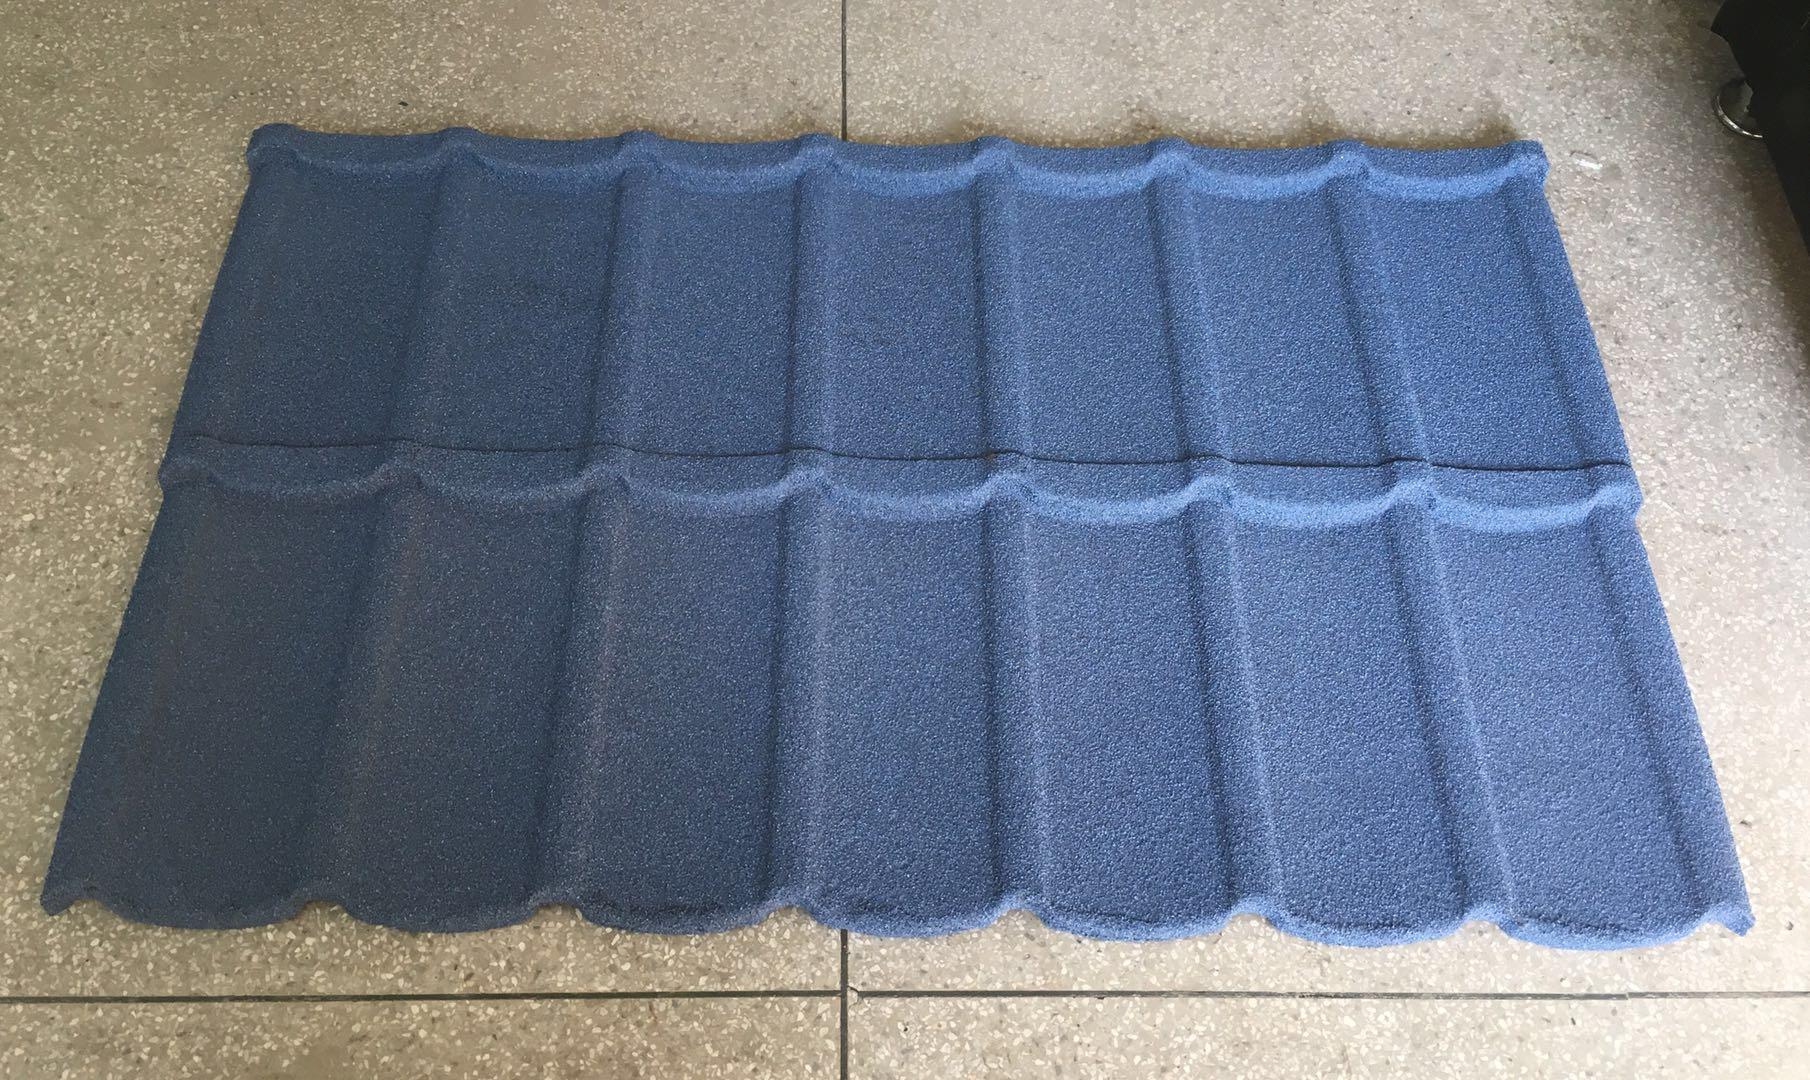 New Sunlight Roof  Array image78